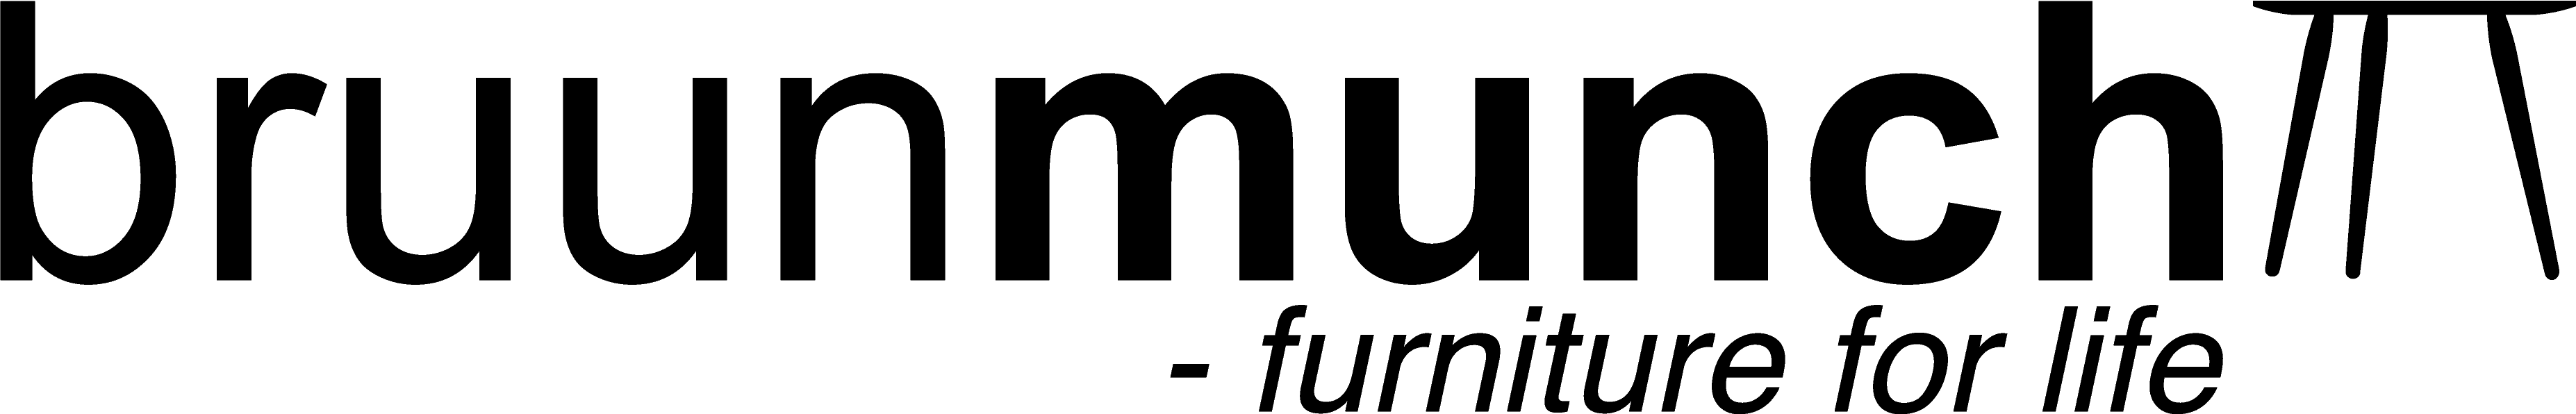 bruunmunch-furniture-for-life-2013-logo